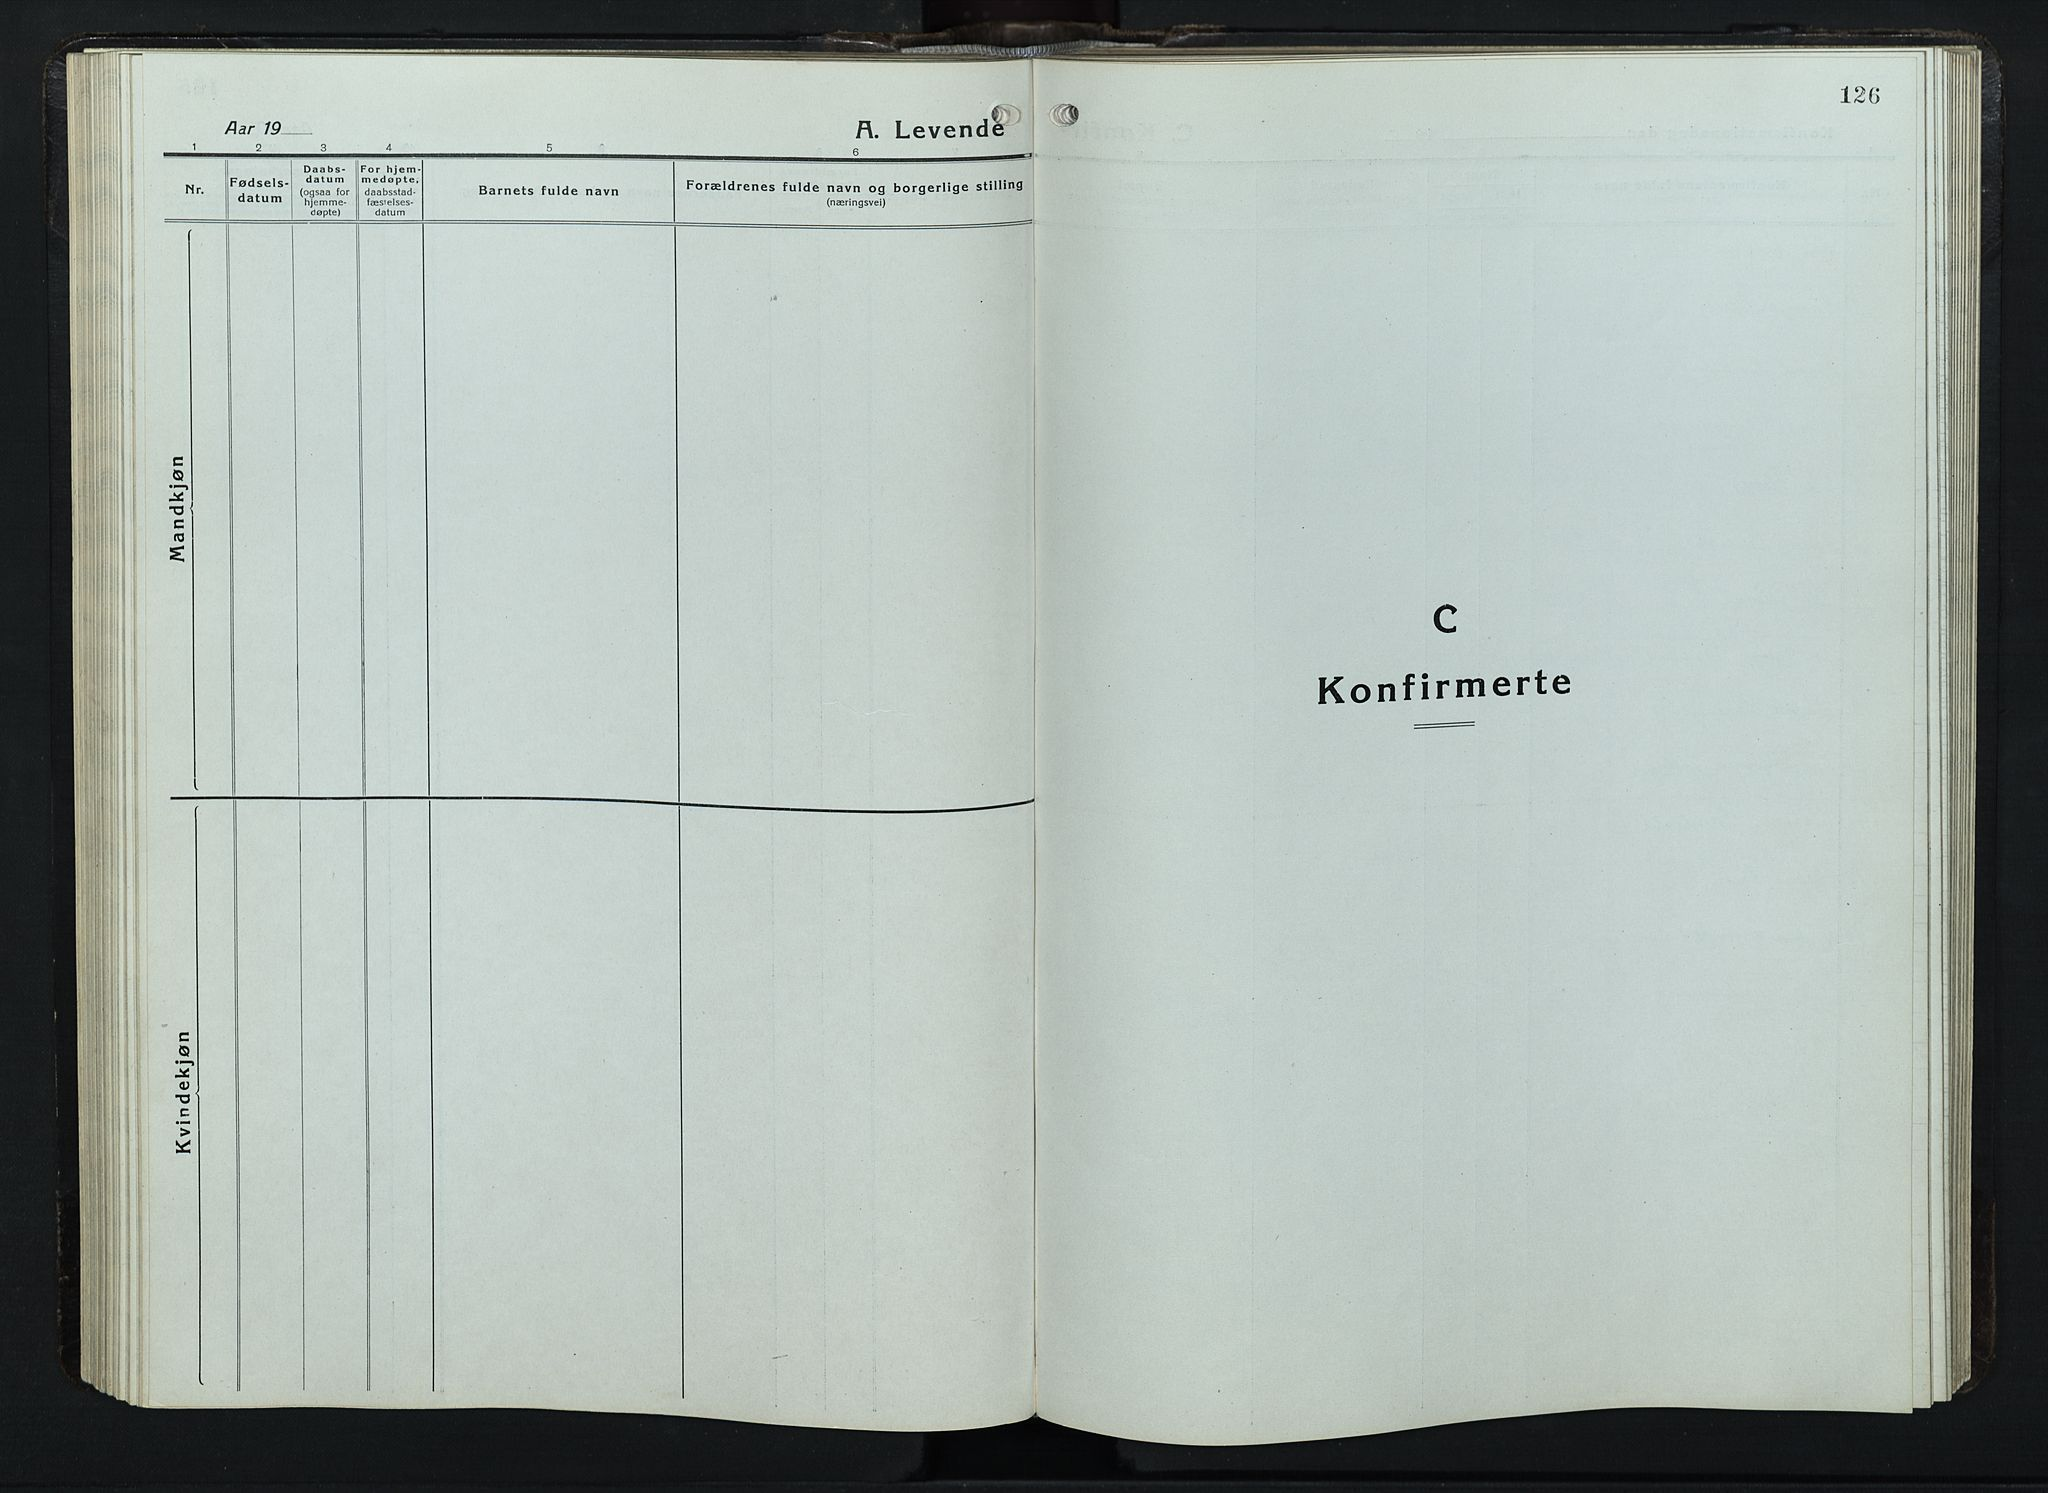 SAH, Balke prestekontor, Klokkerbok nr. 1, 1920-1955, s. 126